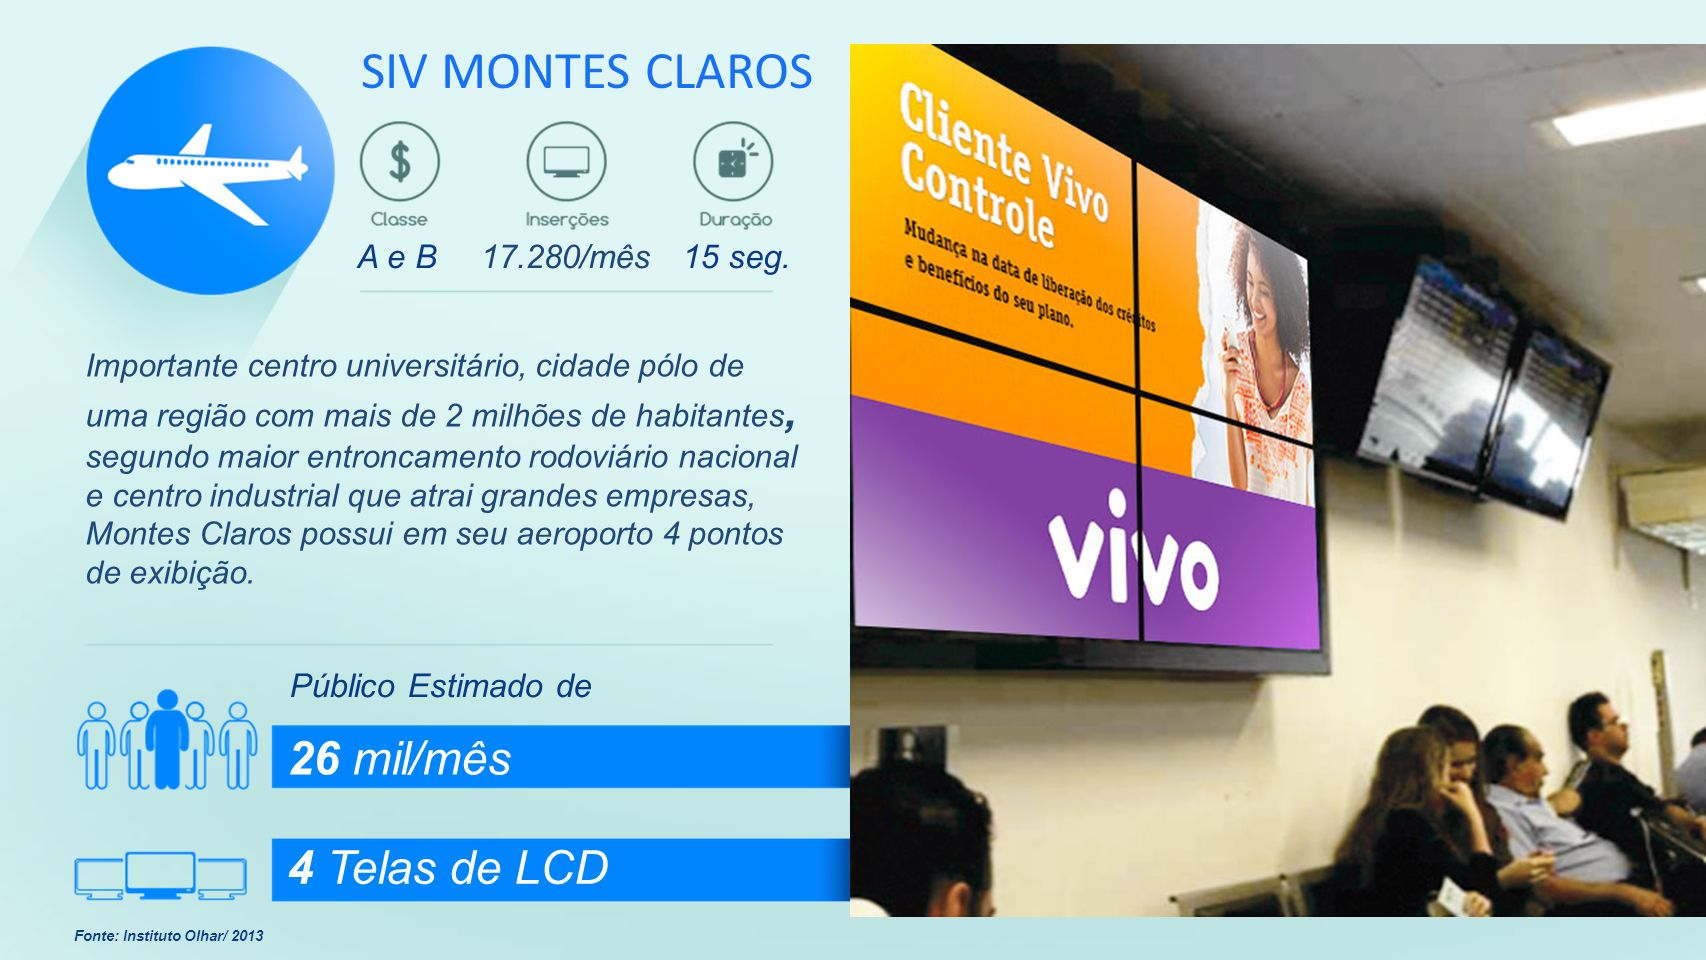 SIV MONTES CLAROS 26 mil/mês 4 Telas de LCD A e B 17.280/mês 15 seg.